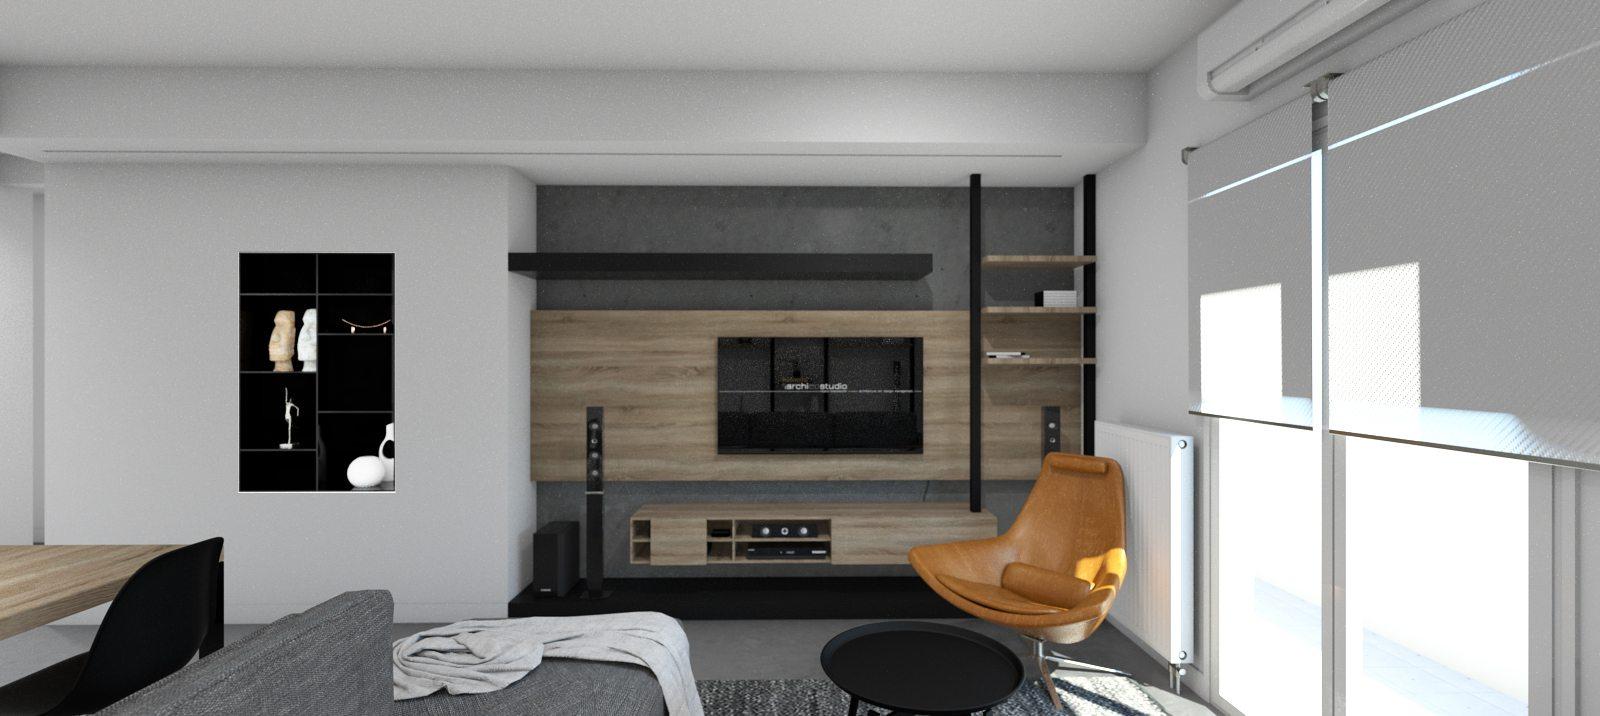 archicostudio_house-ts05_tv-furniture